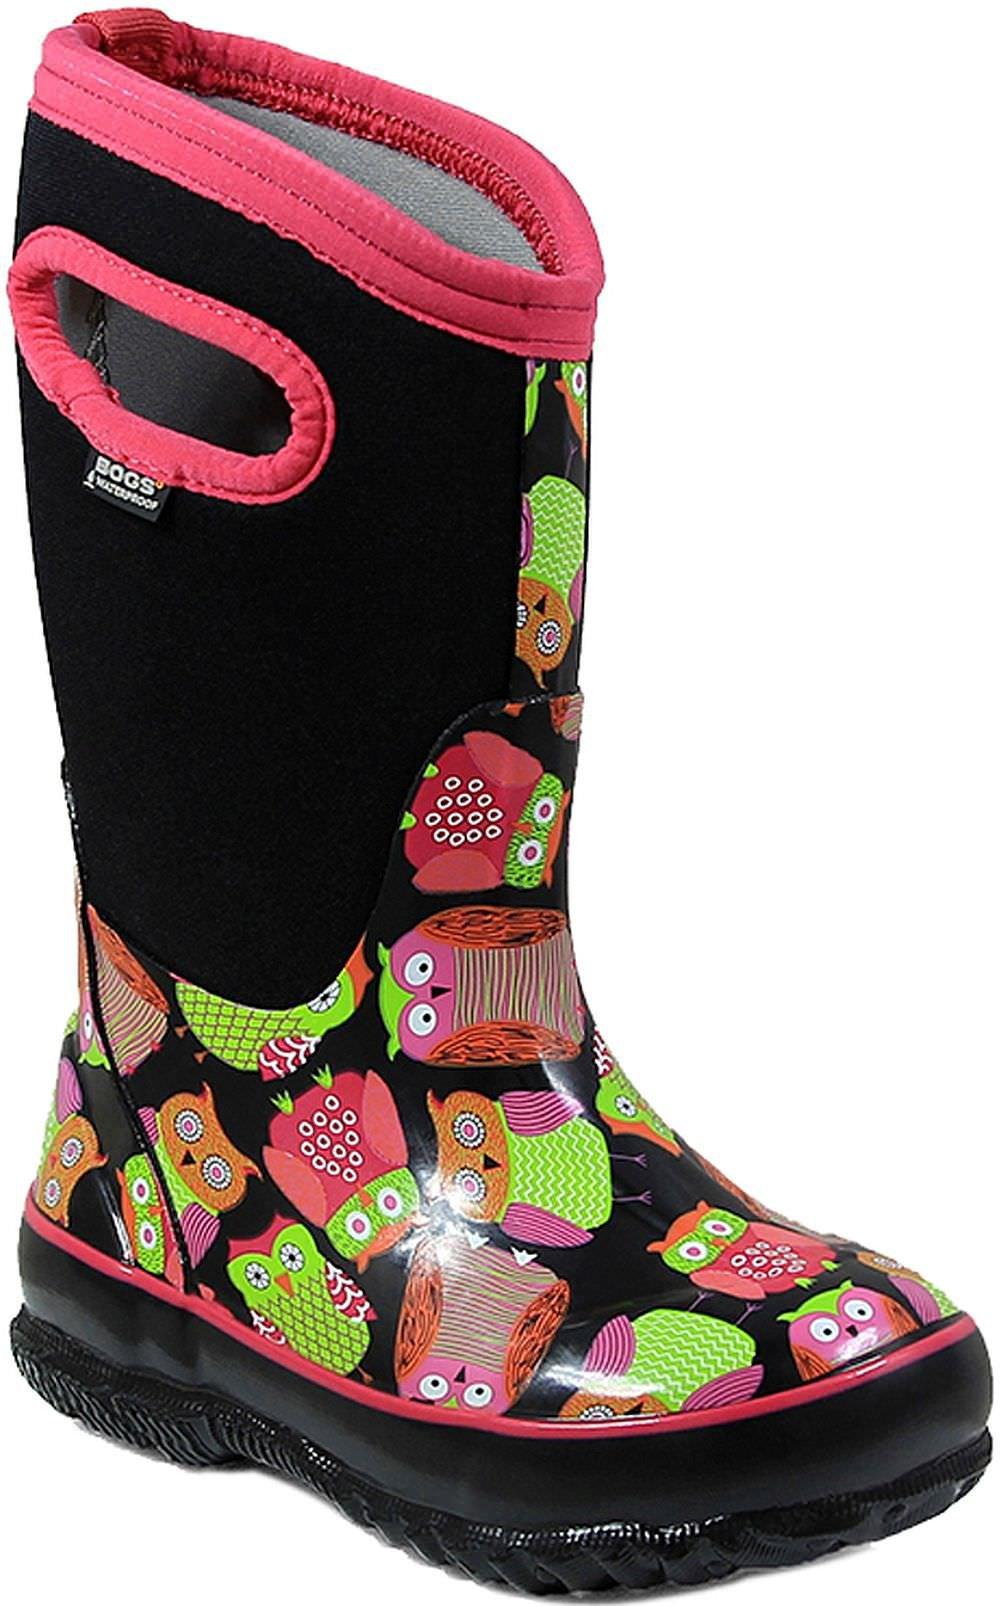 Bogs Kids' Classic High Waterproof Insulated Rubber Neoprene Rain Snow Boot, Owl Print/Black/Multi, 10 M US Toddler